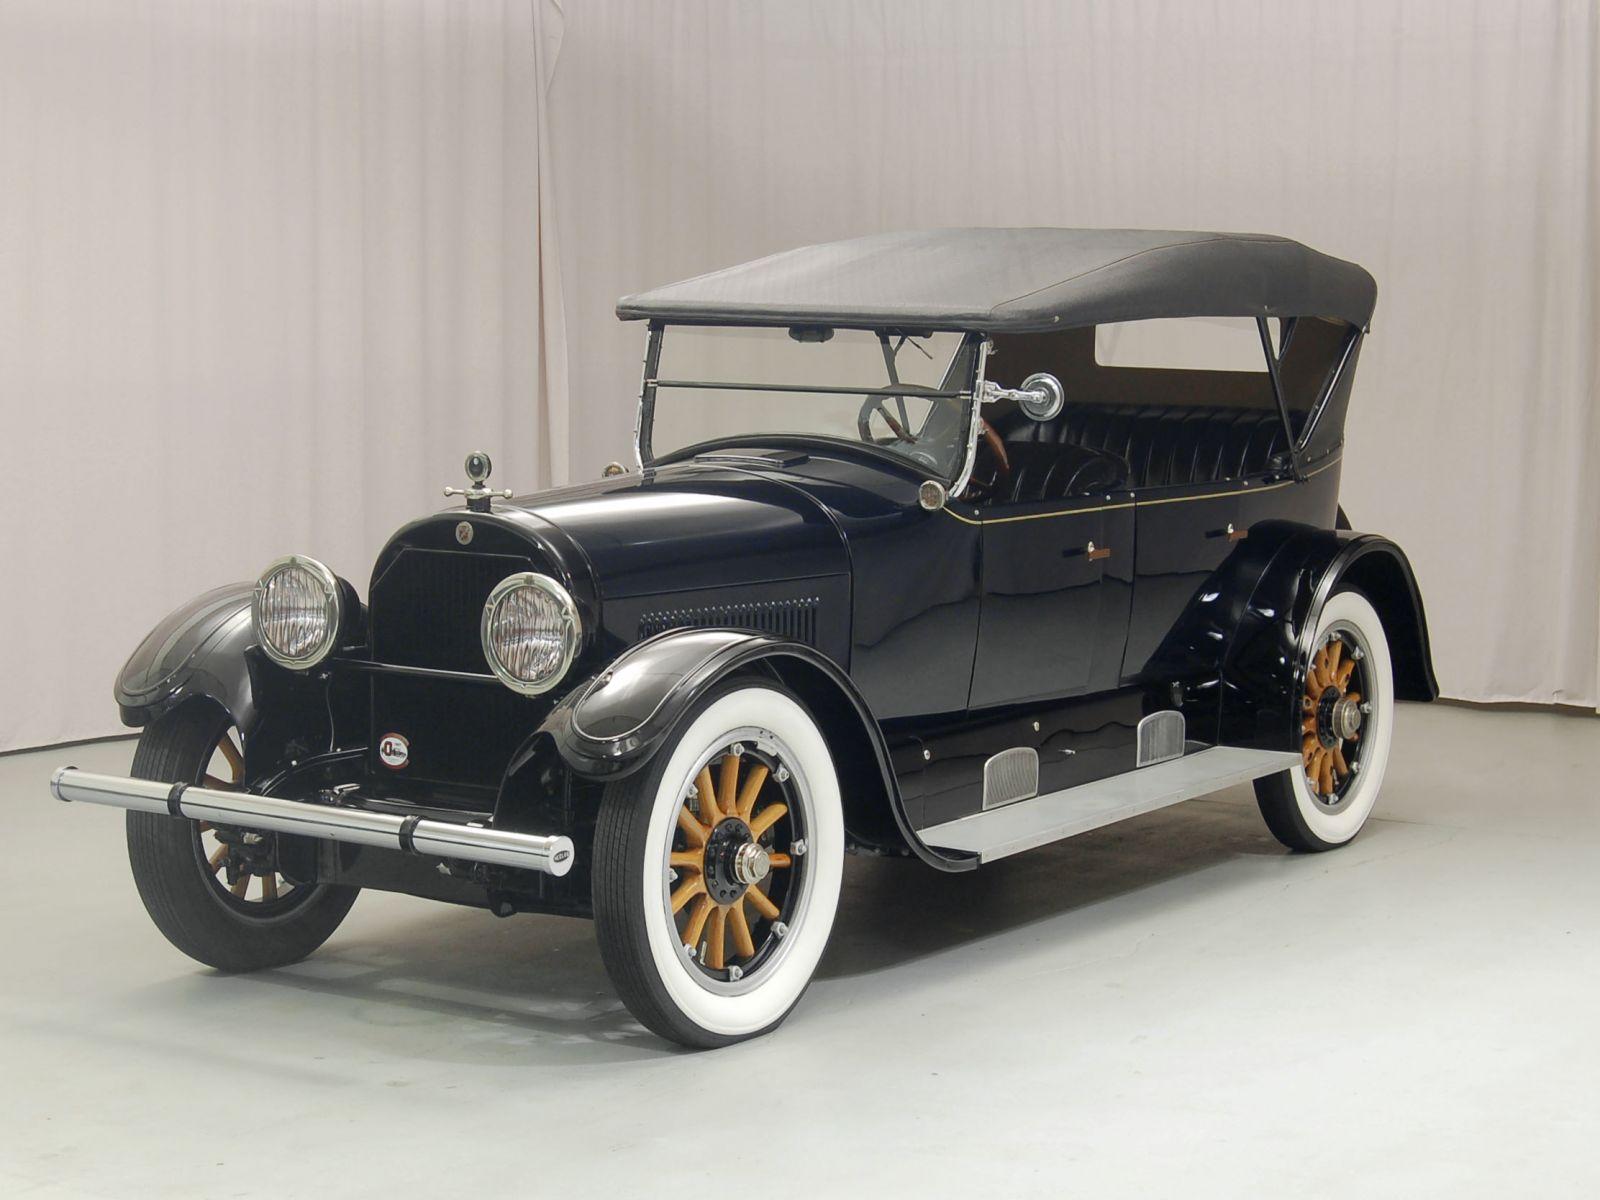 1922 Cadillac Phaeton Classic Cars Hyman Ltd